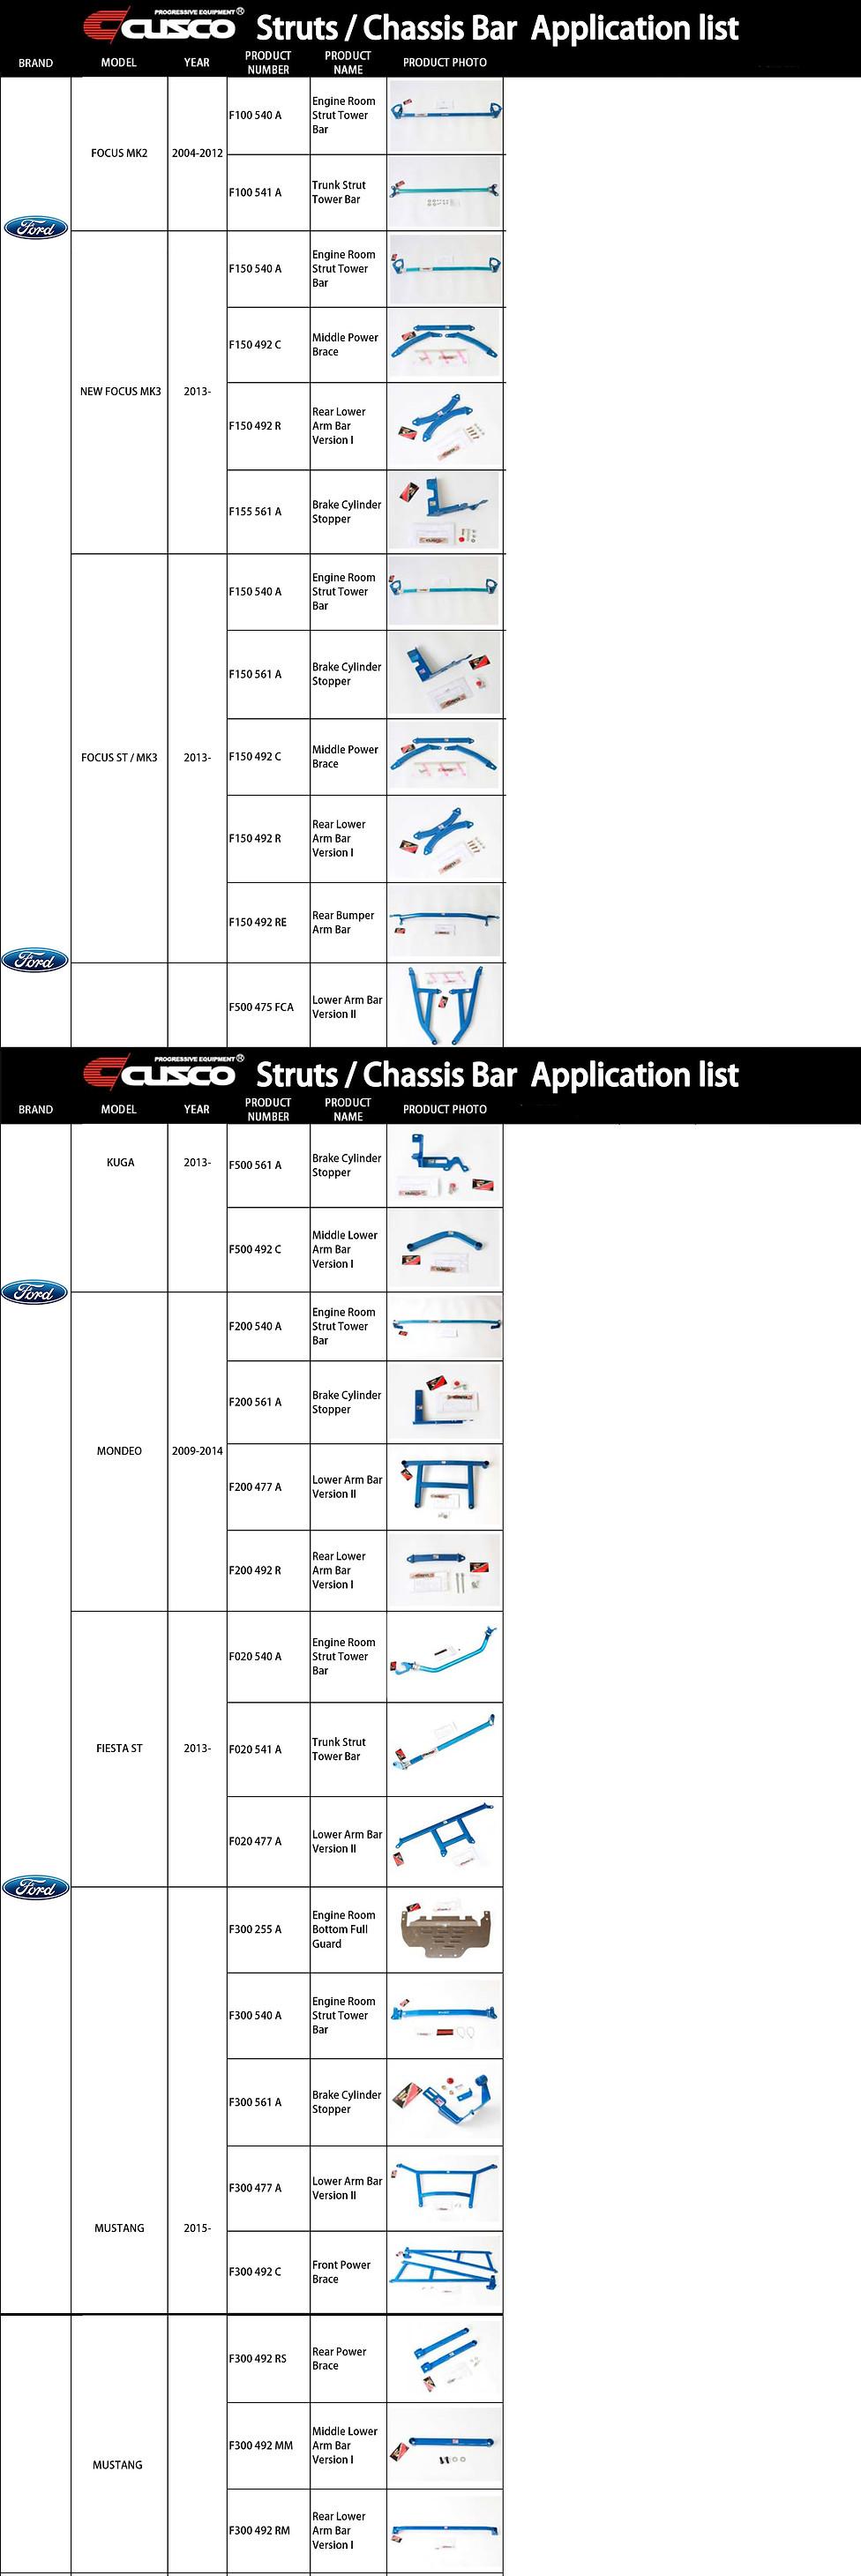 CUSCO-ford-application-list.jpg